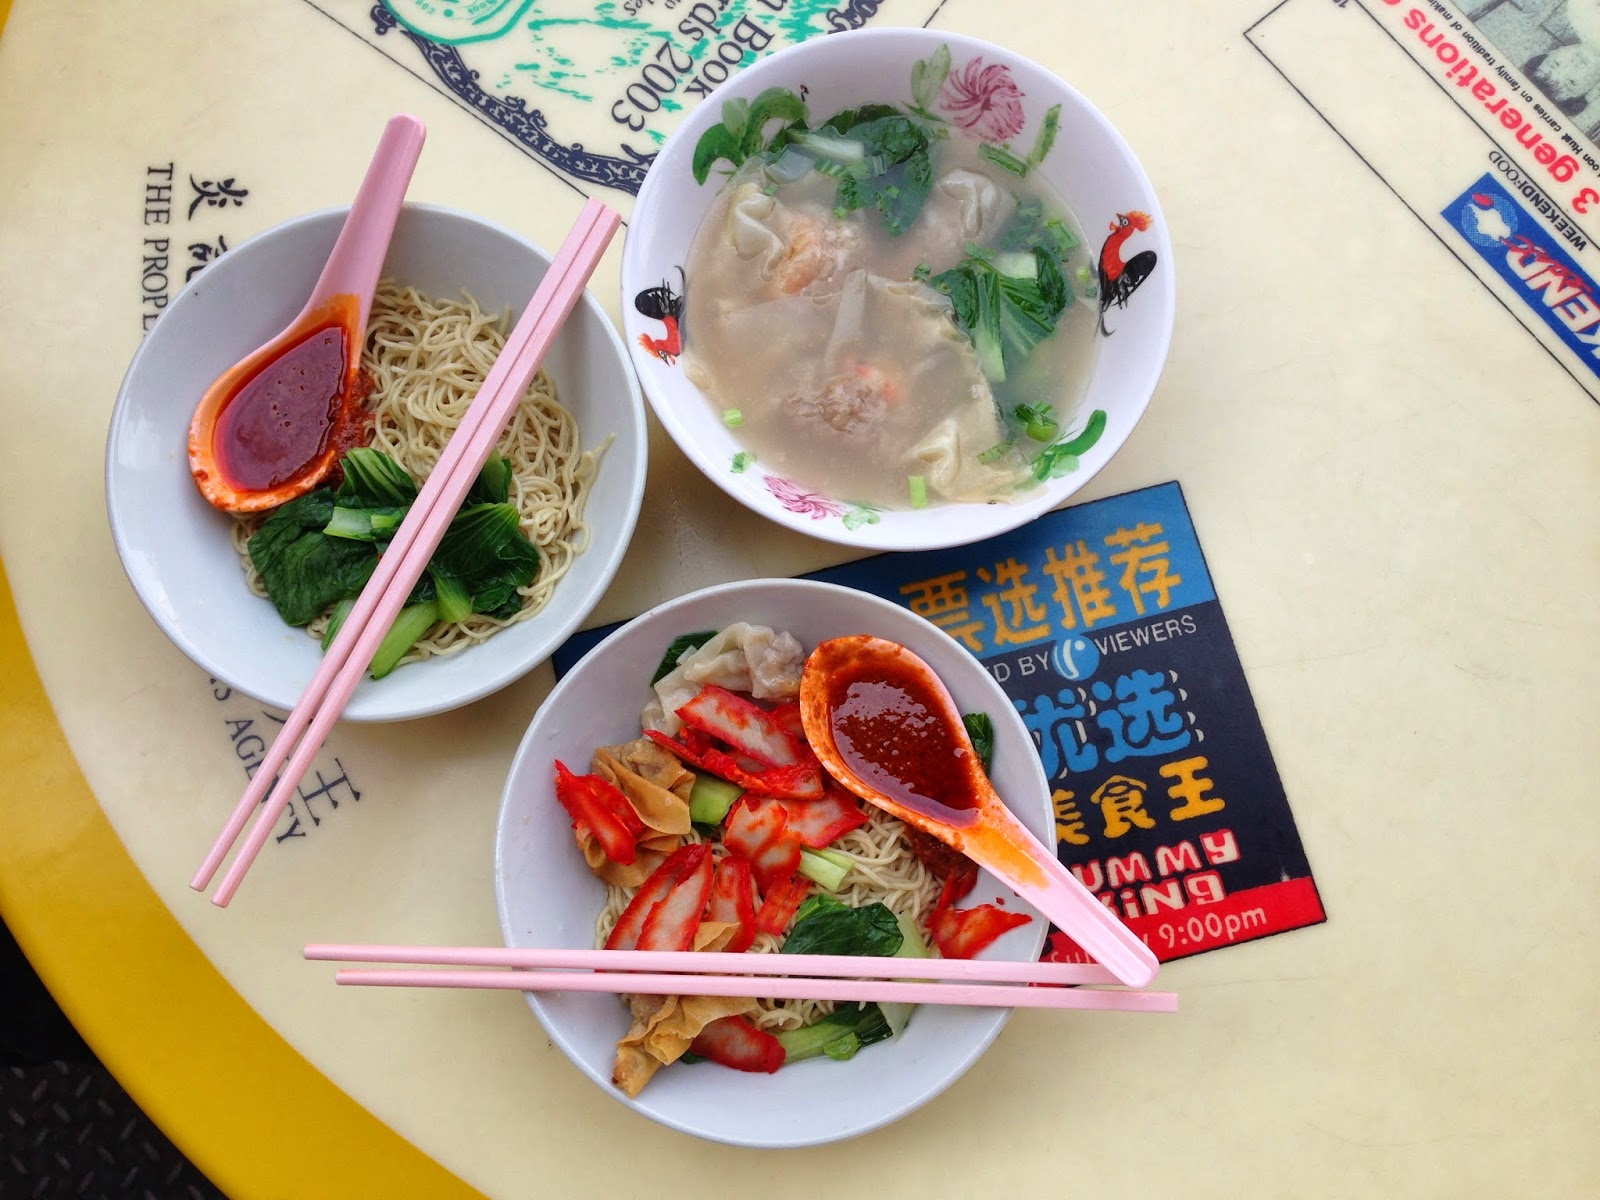 Fei Fei Wanton Mee Joo Chiat Place